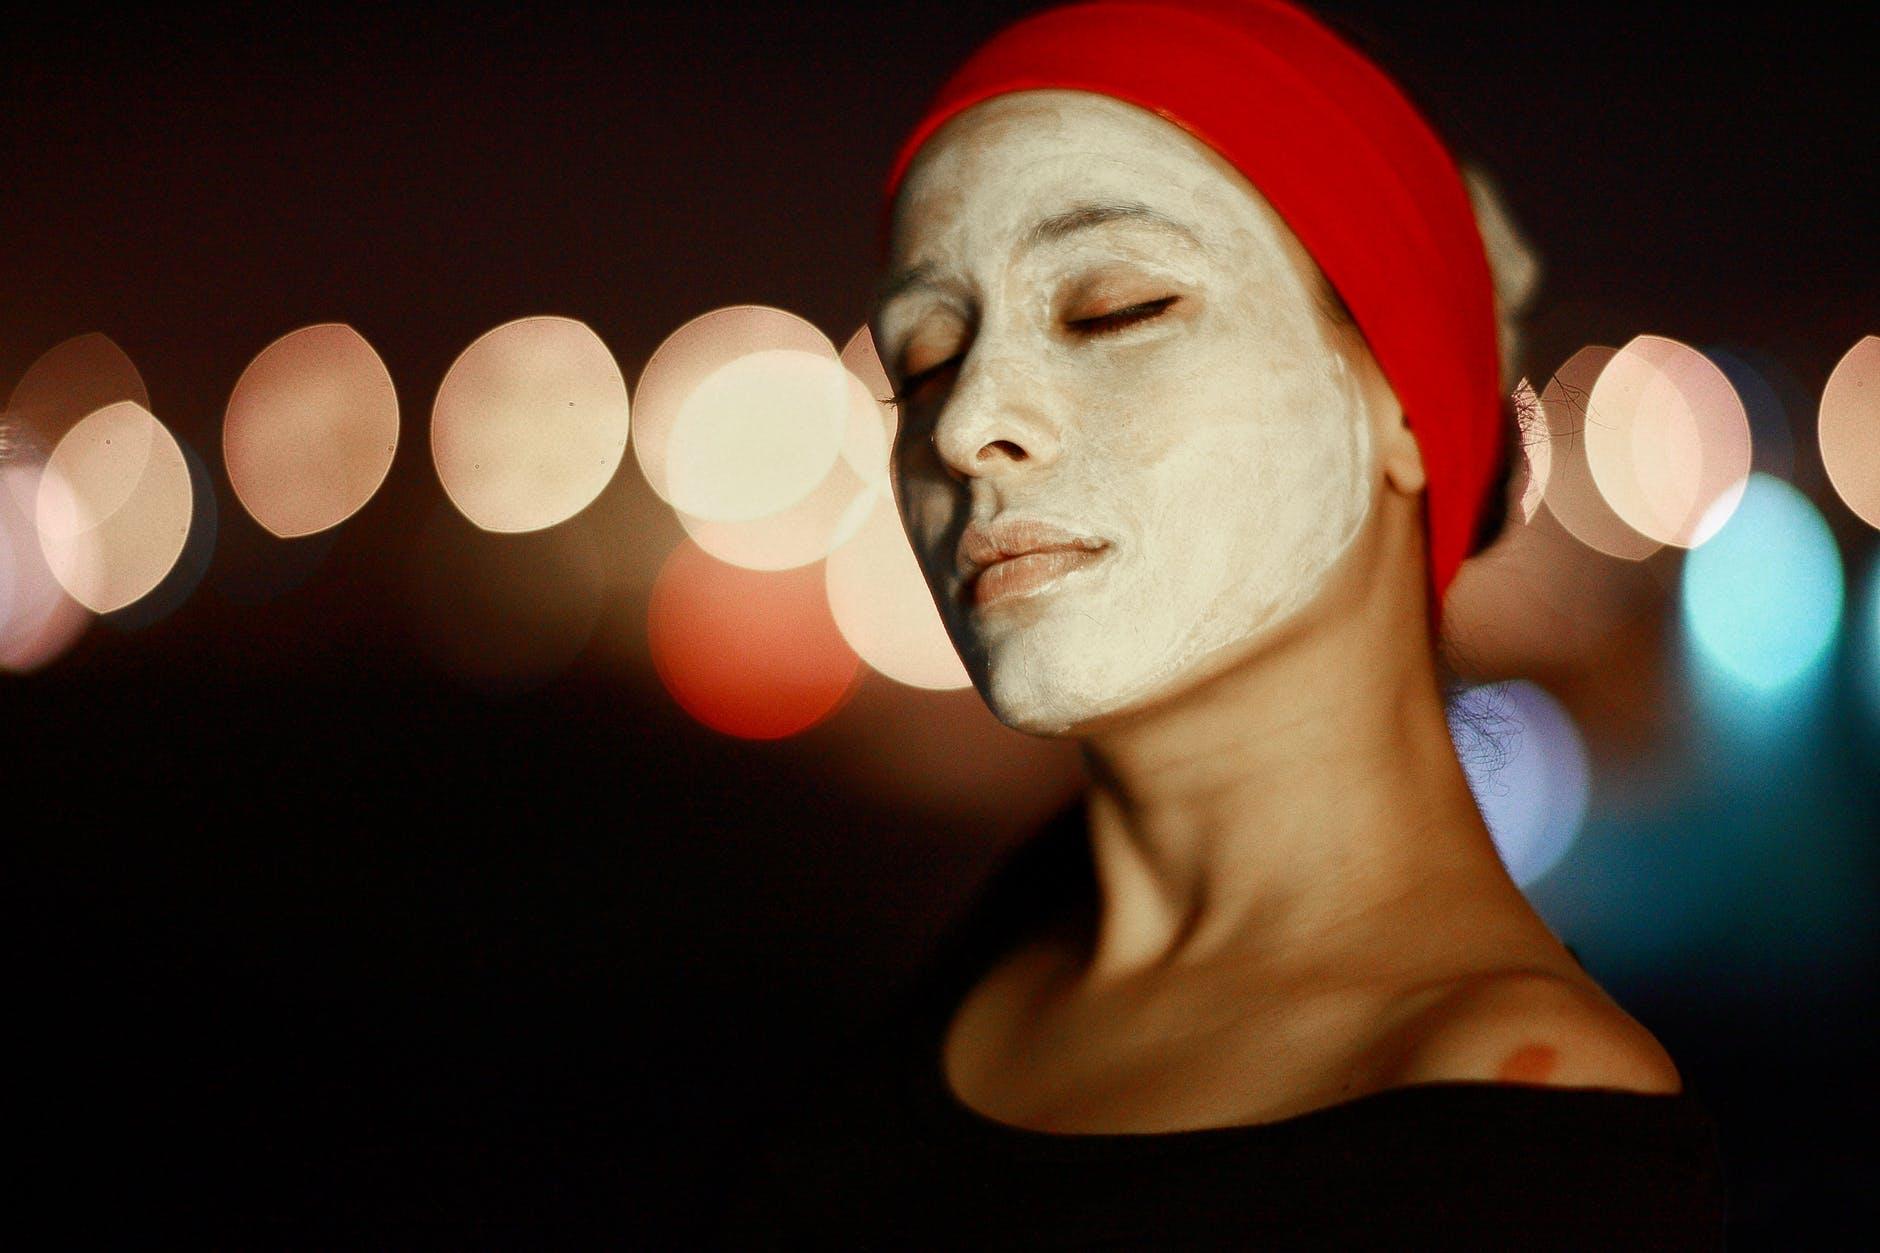 sandalwood face masks for dry skin